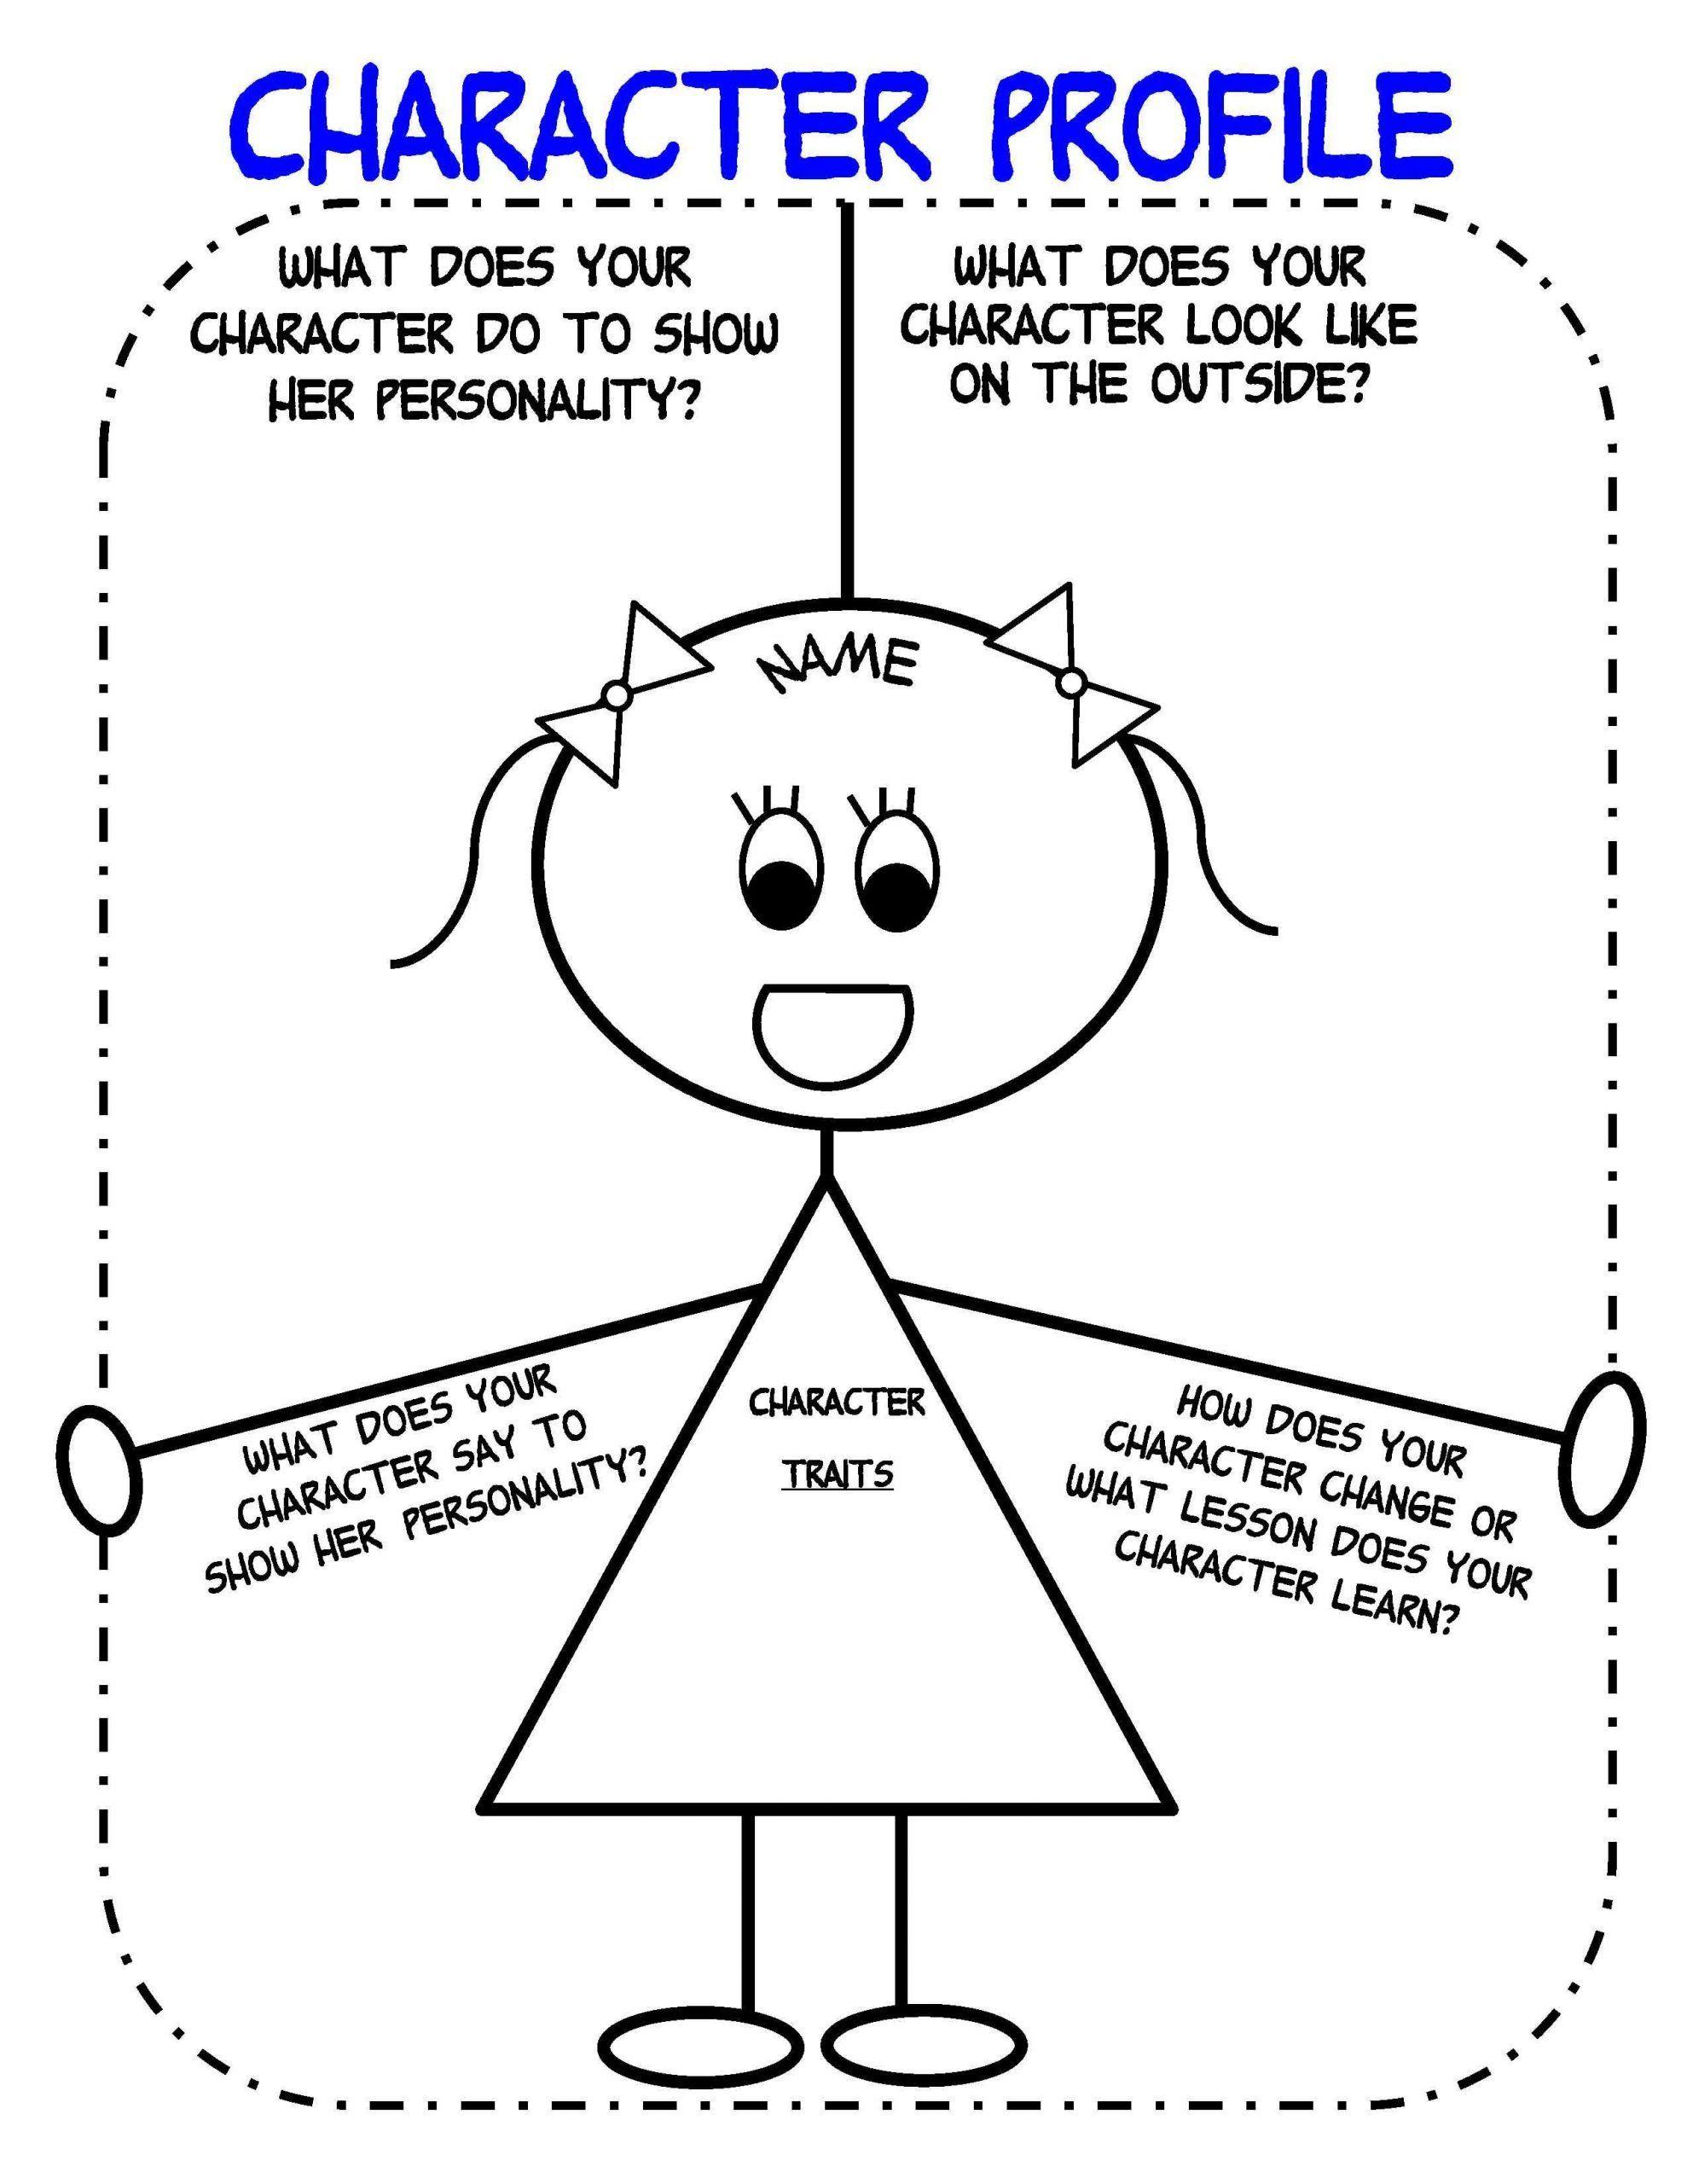 Character Traits Graphic Organizer Body Bringing